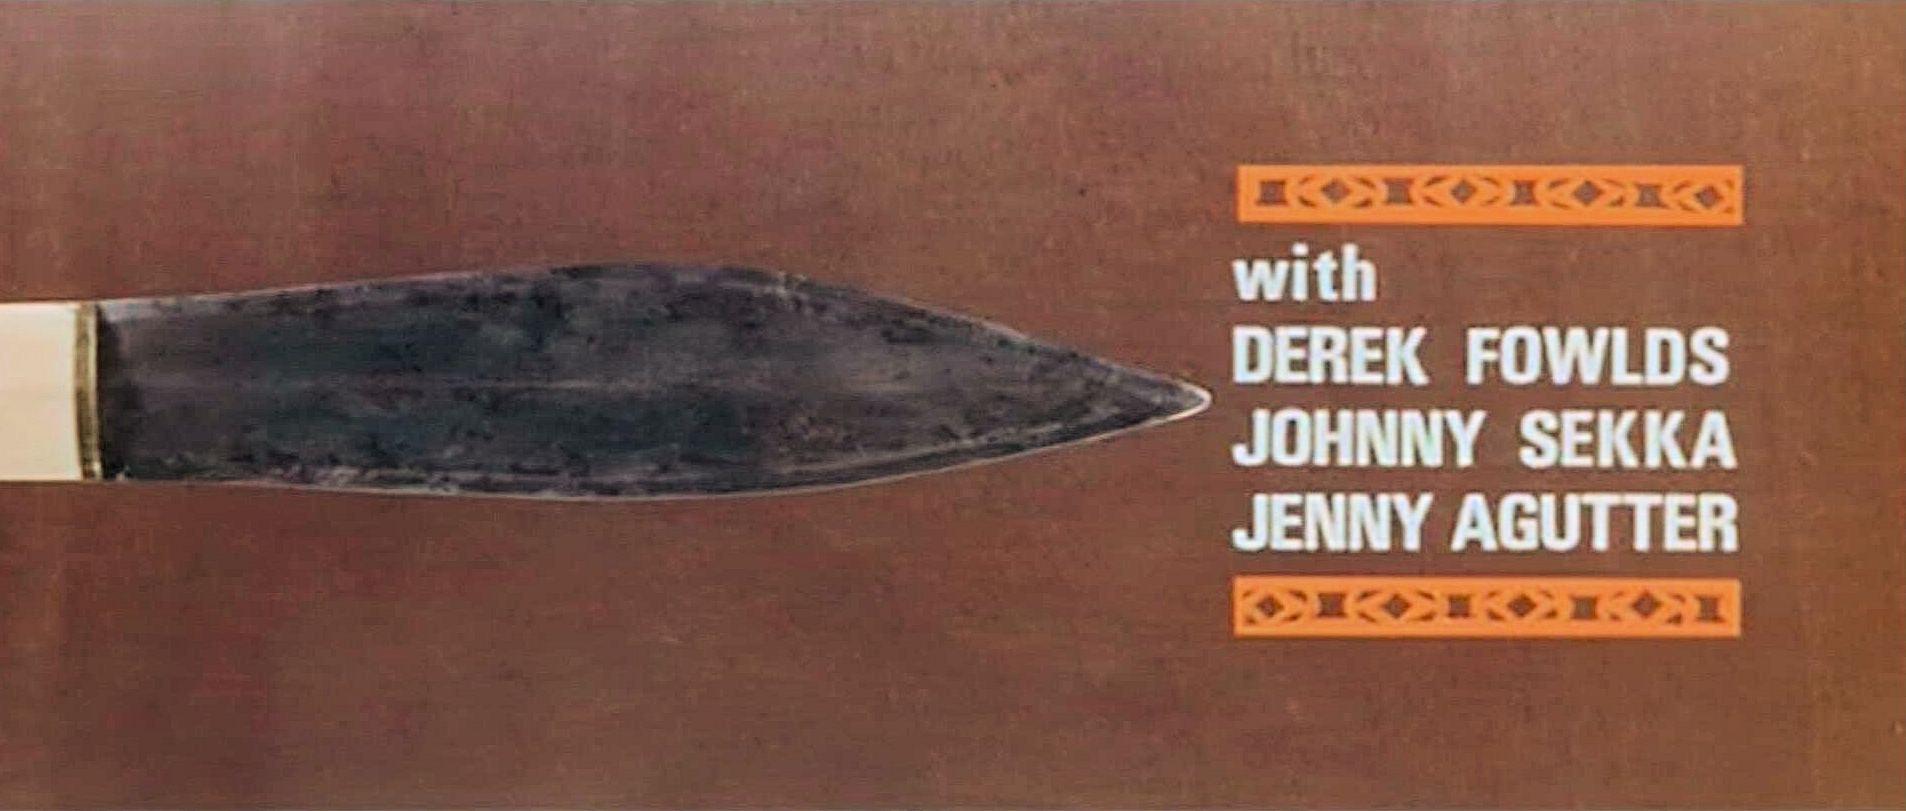 Main title from East of Sudan (1964) (5). Derek Fowlds, Johnny Sekka, Jenny Agutter